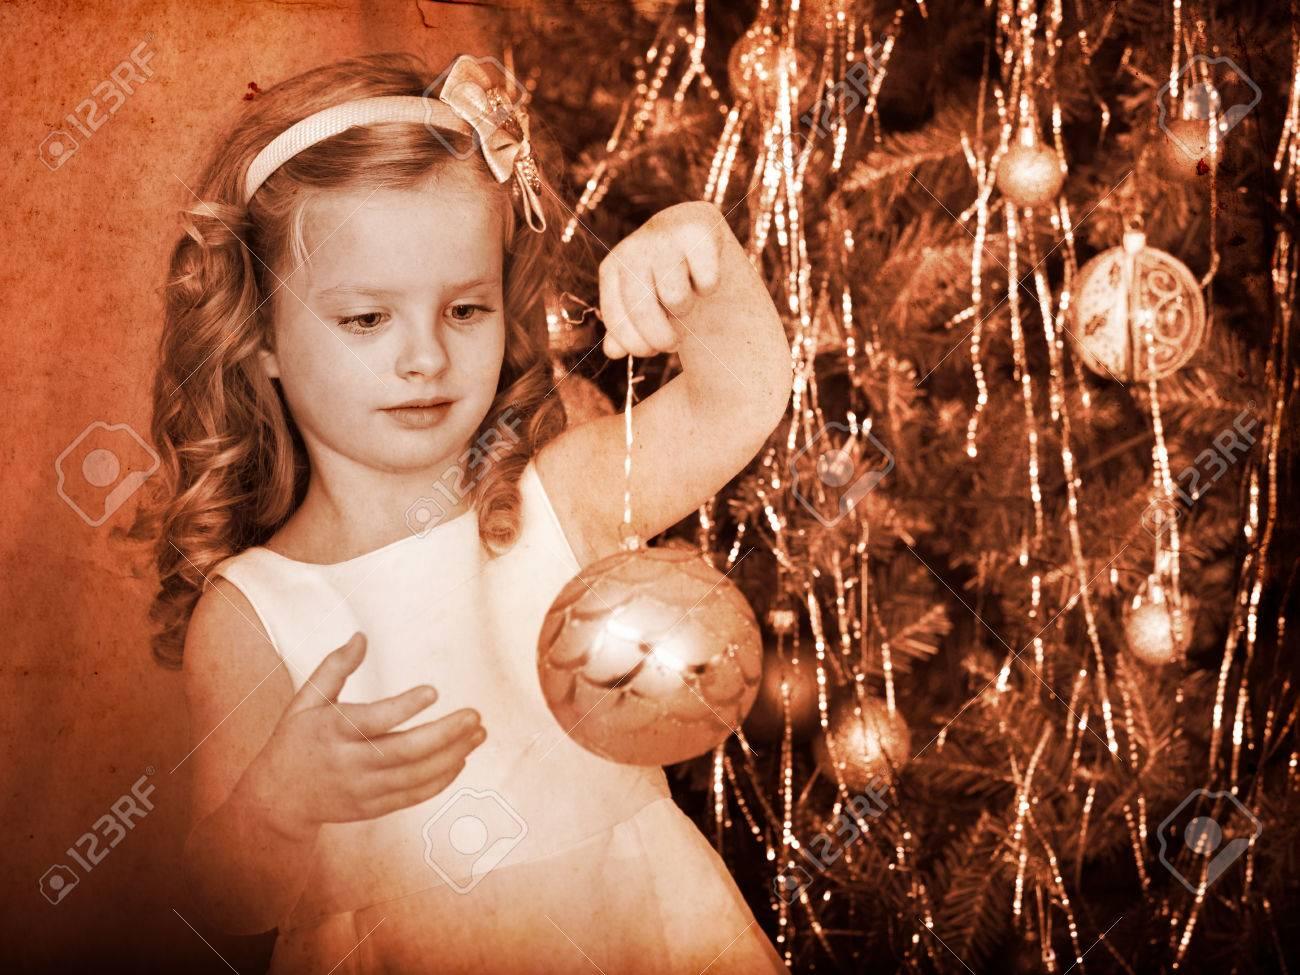 Child decorate on Christmas tree. Black and white retro. Stock Photo - 24177249